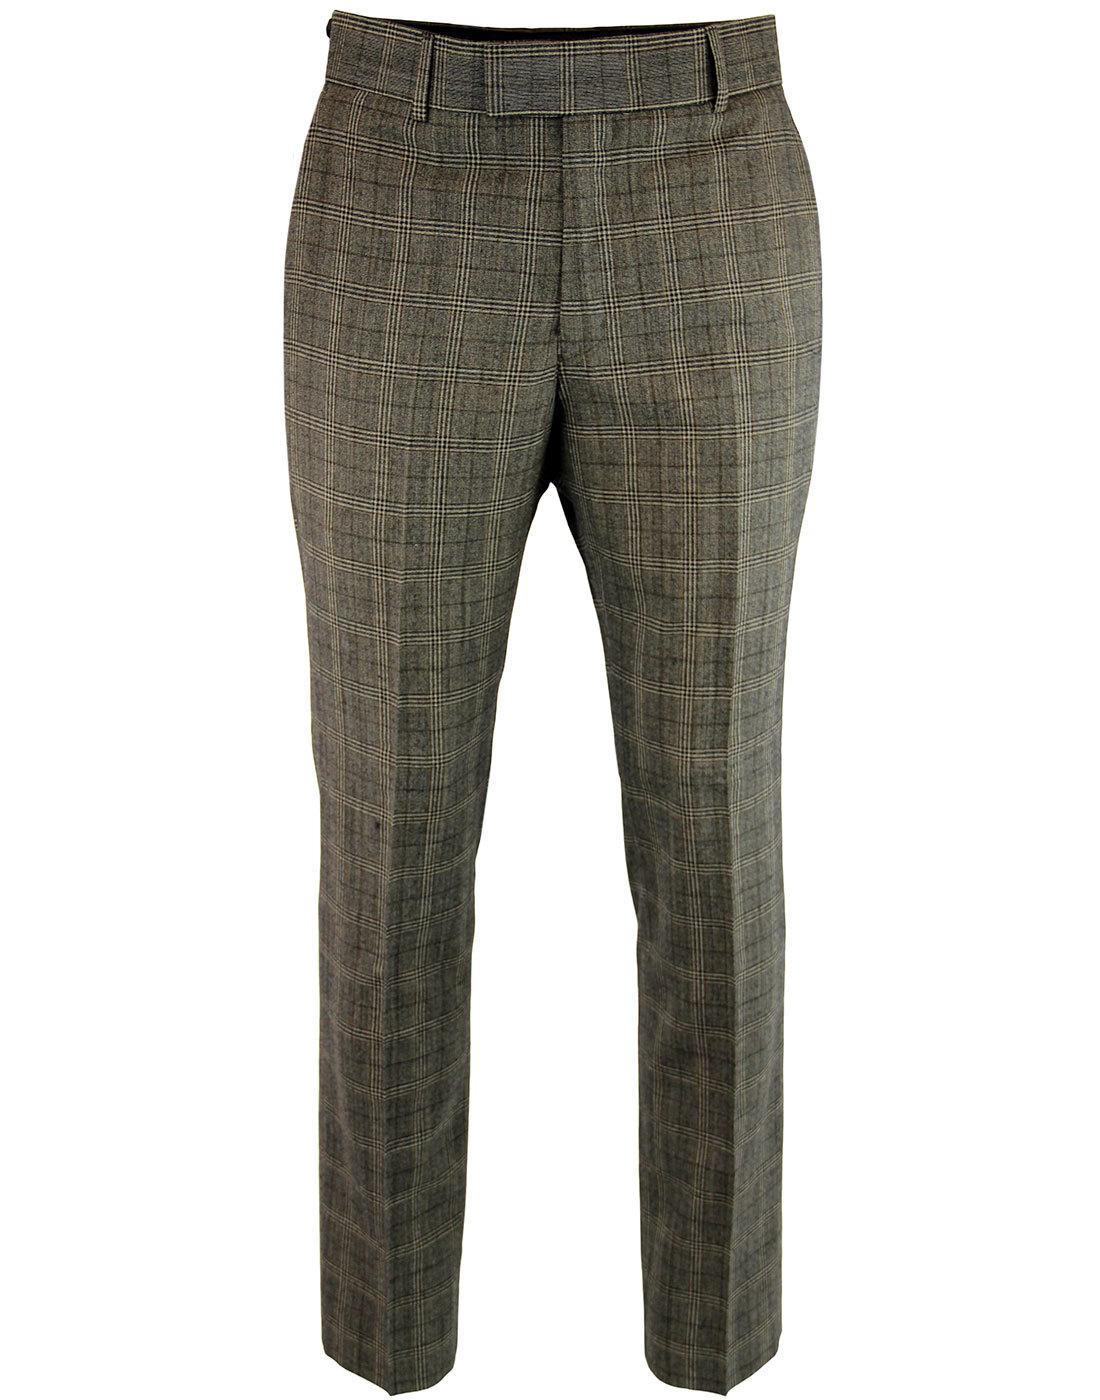 GIBSON LONDON Retro Slim Mod Check Suit Trousers